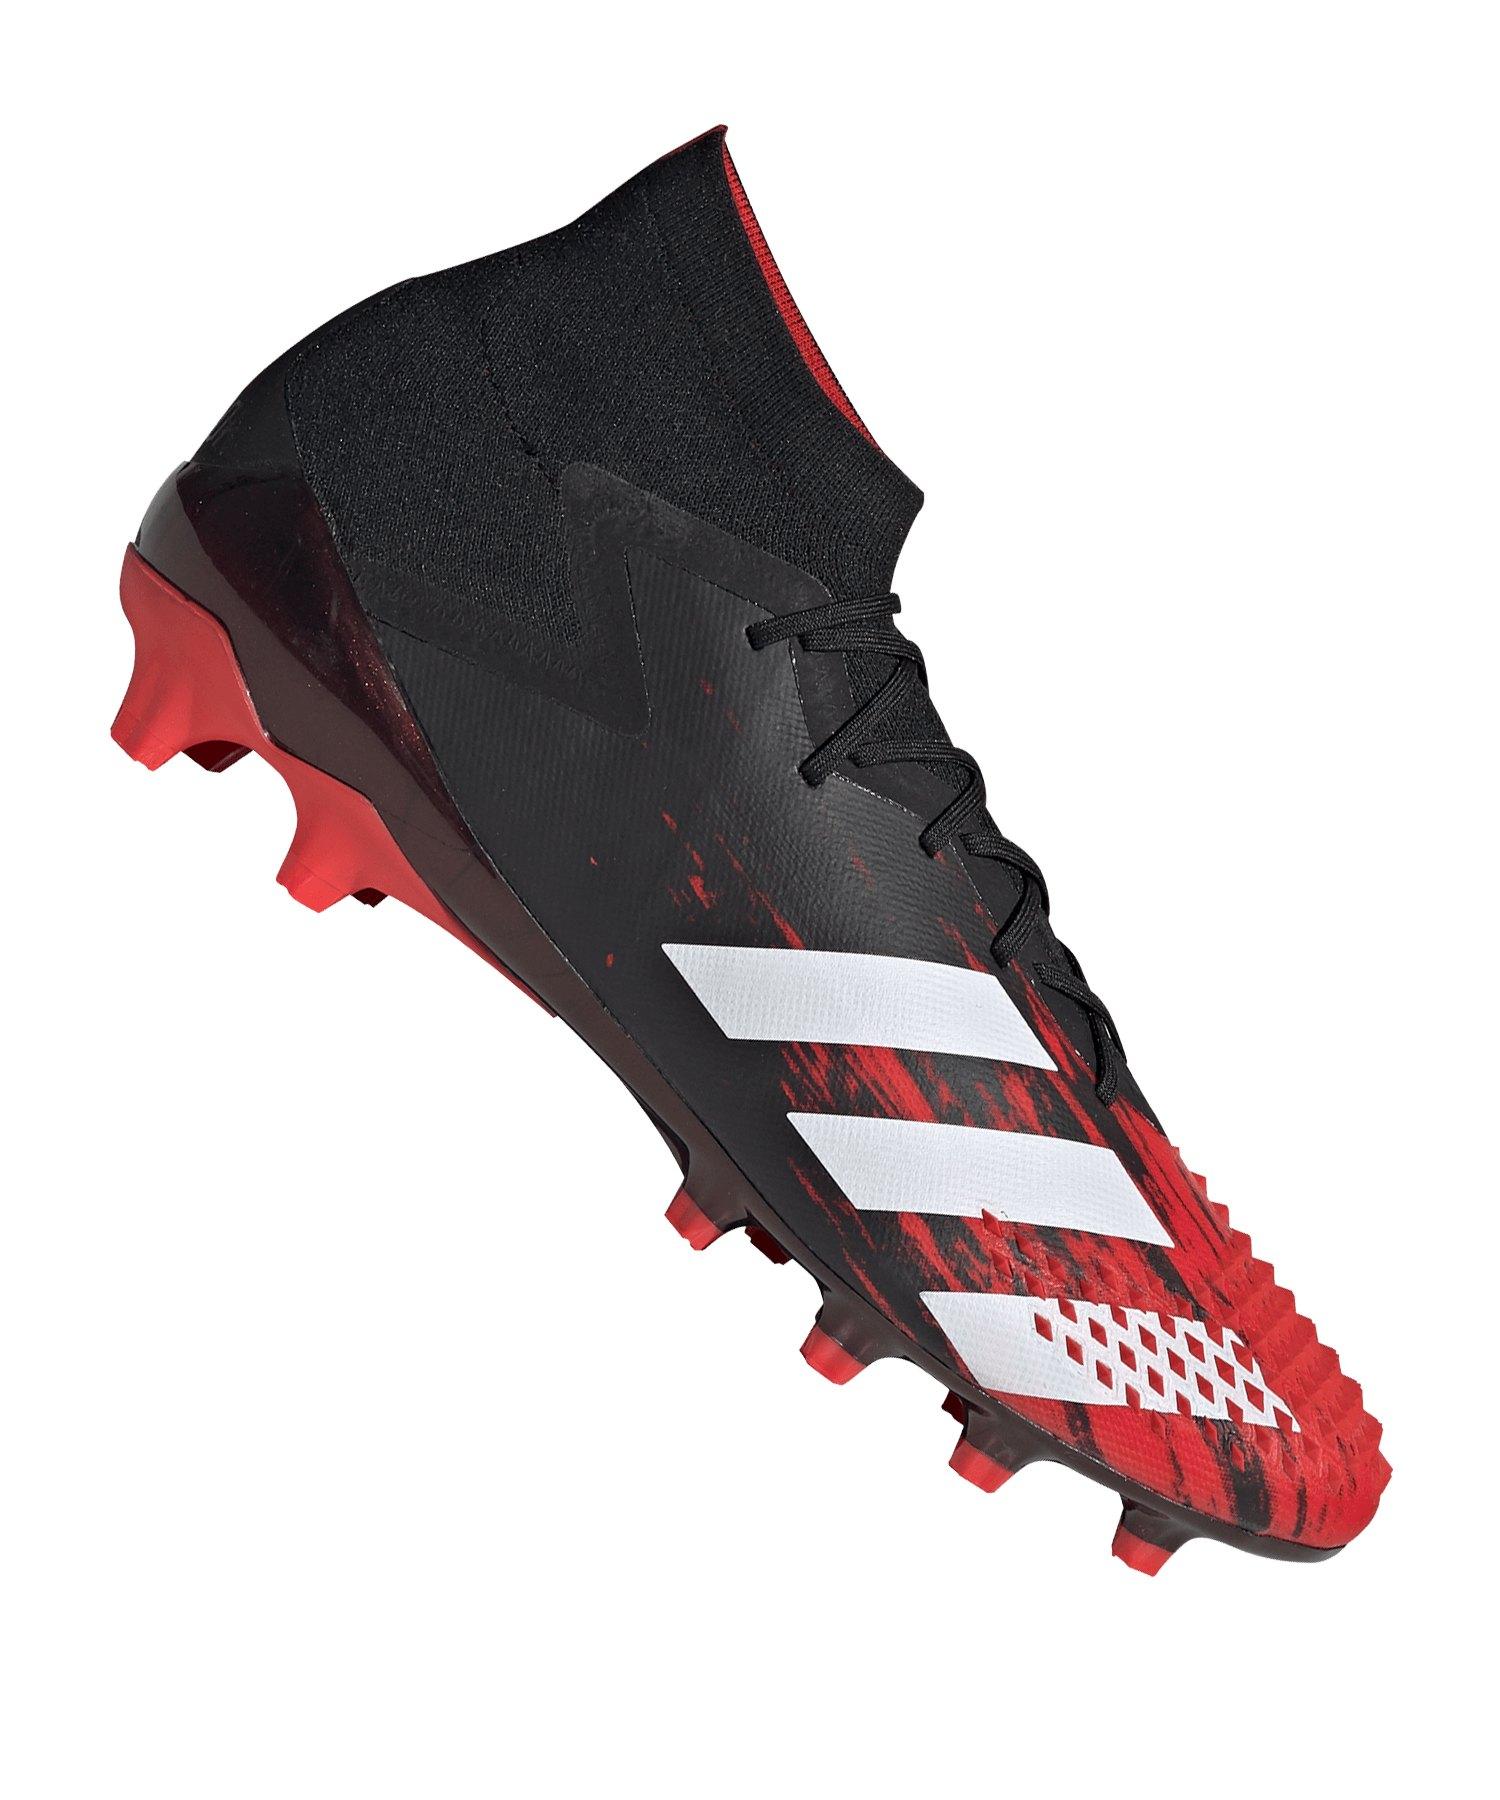 adidas Predator 20.1 AG Schwarz Rot - schwarz